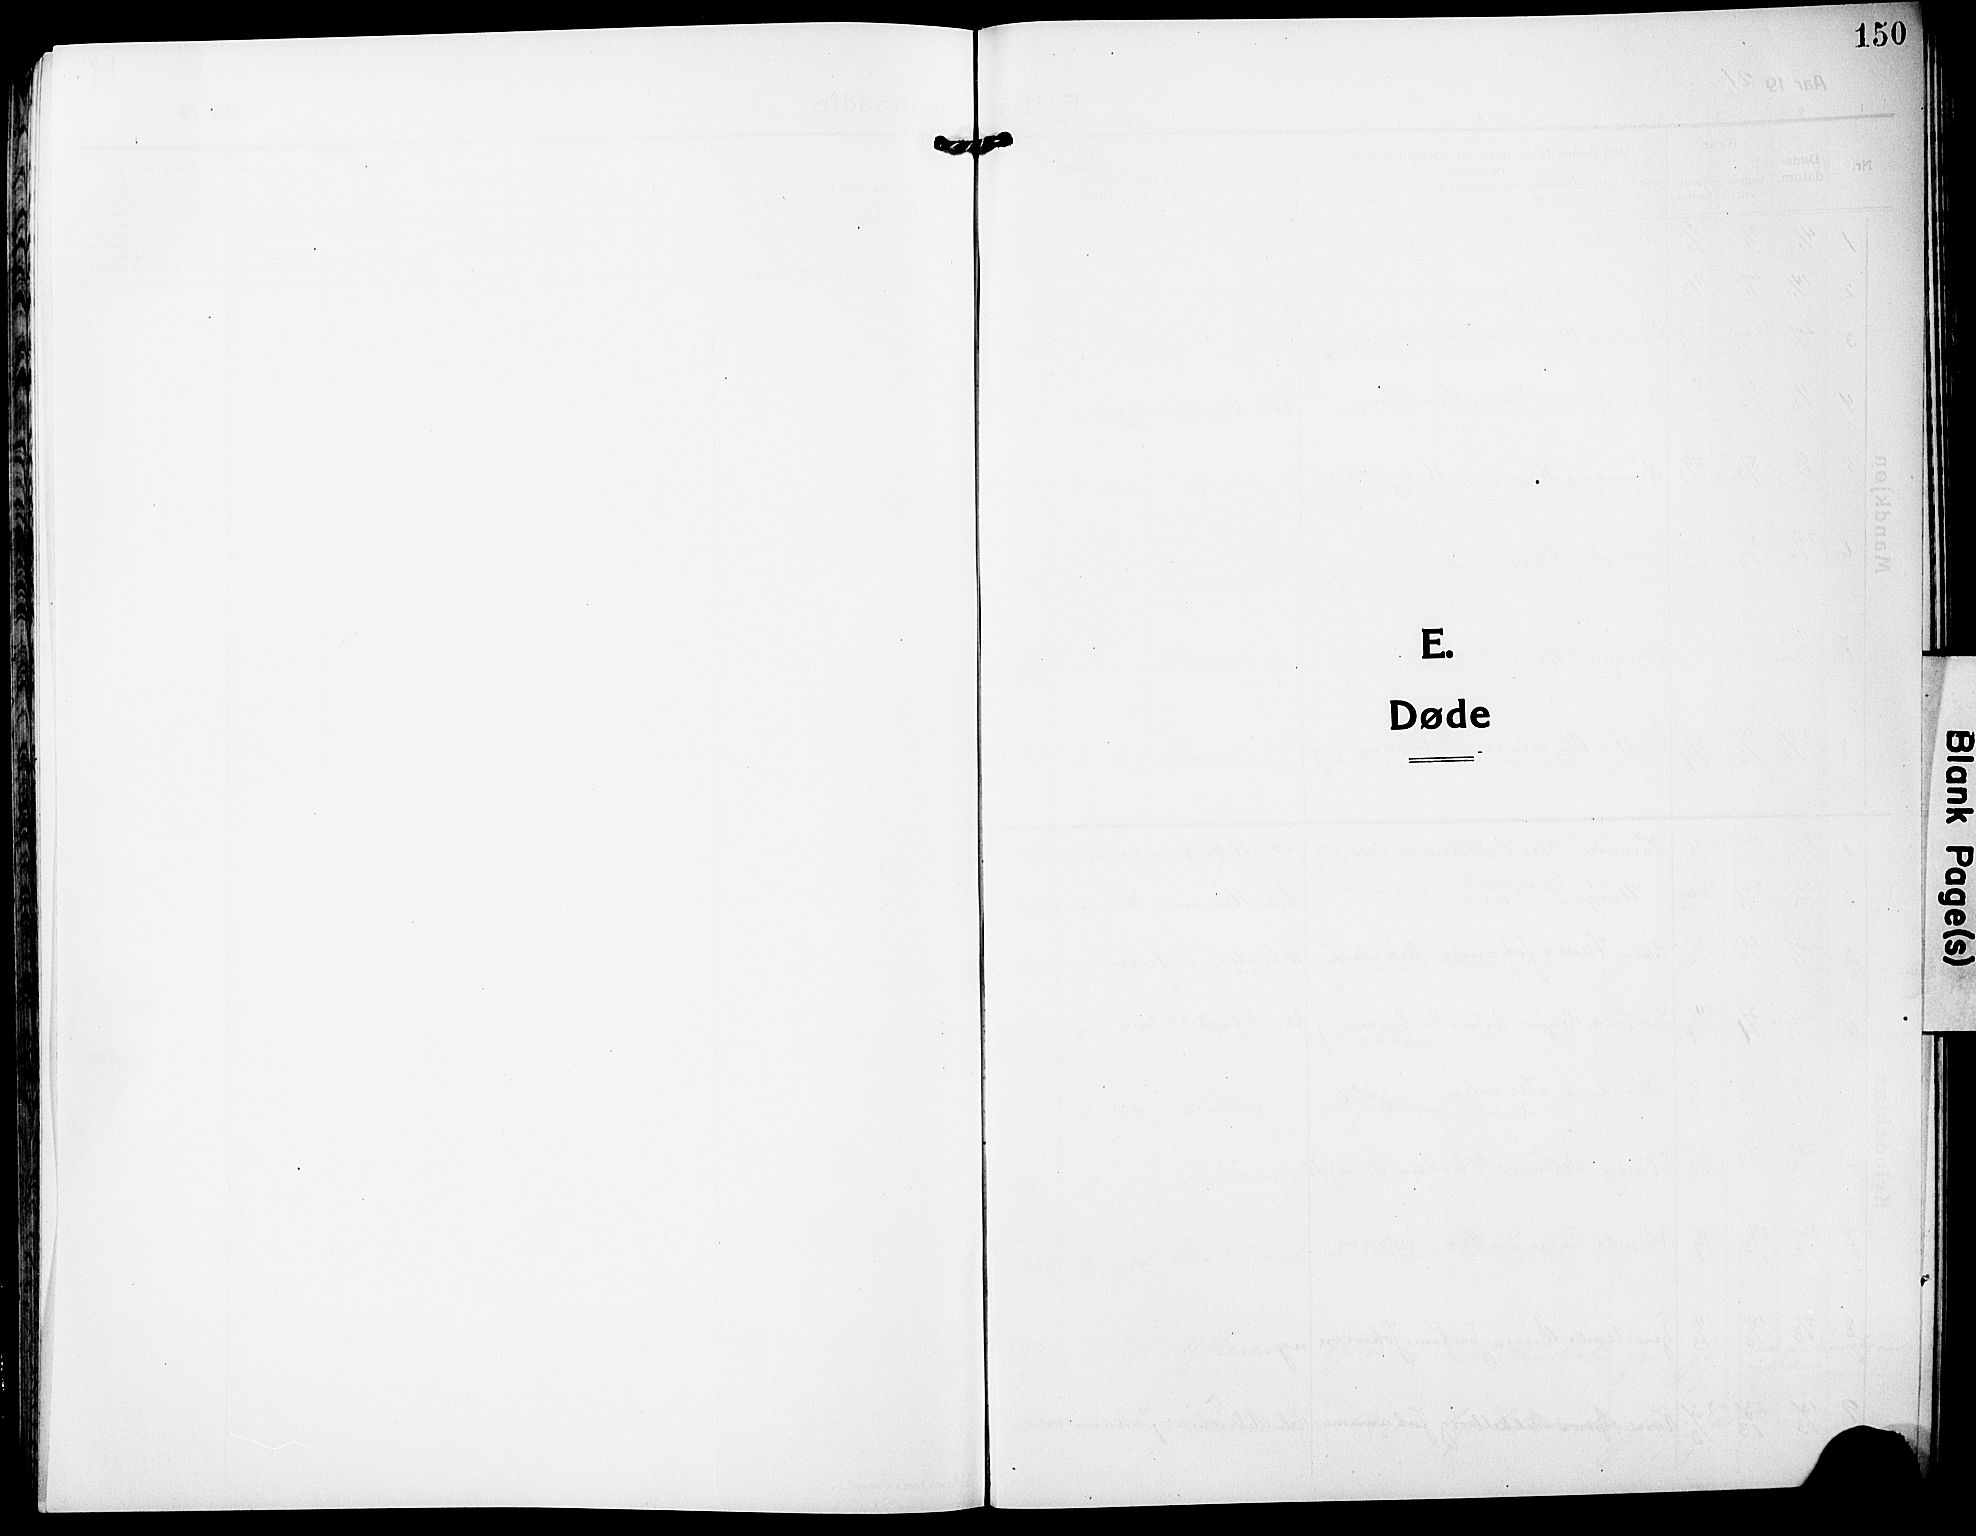 SAT, Ministerialprotokoller, klokkerbøker og fødselsregistre - Nordland, 827/L0424: Klokkerbok nr. 827C13, 1921-1930, s. 150